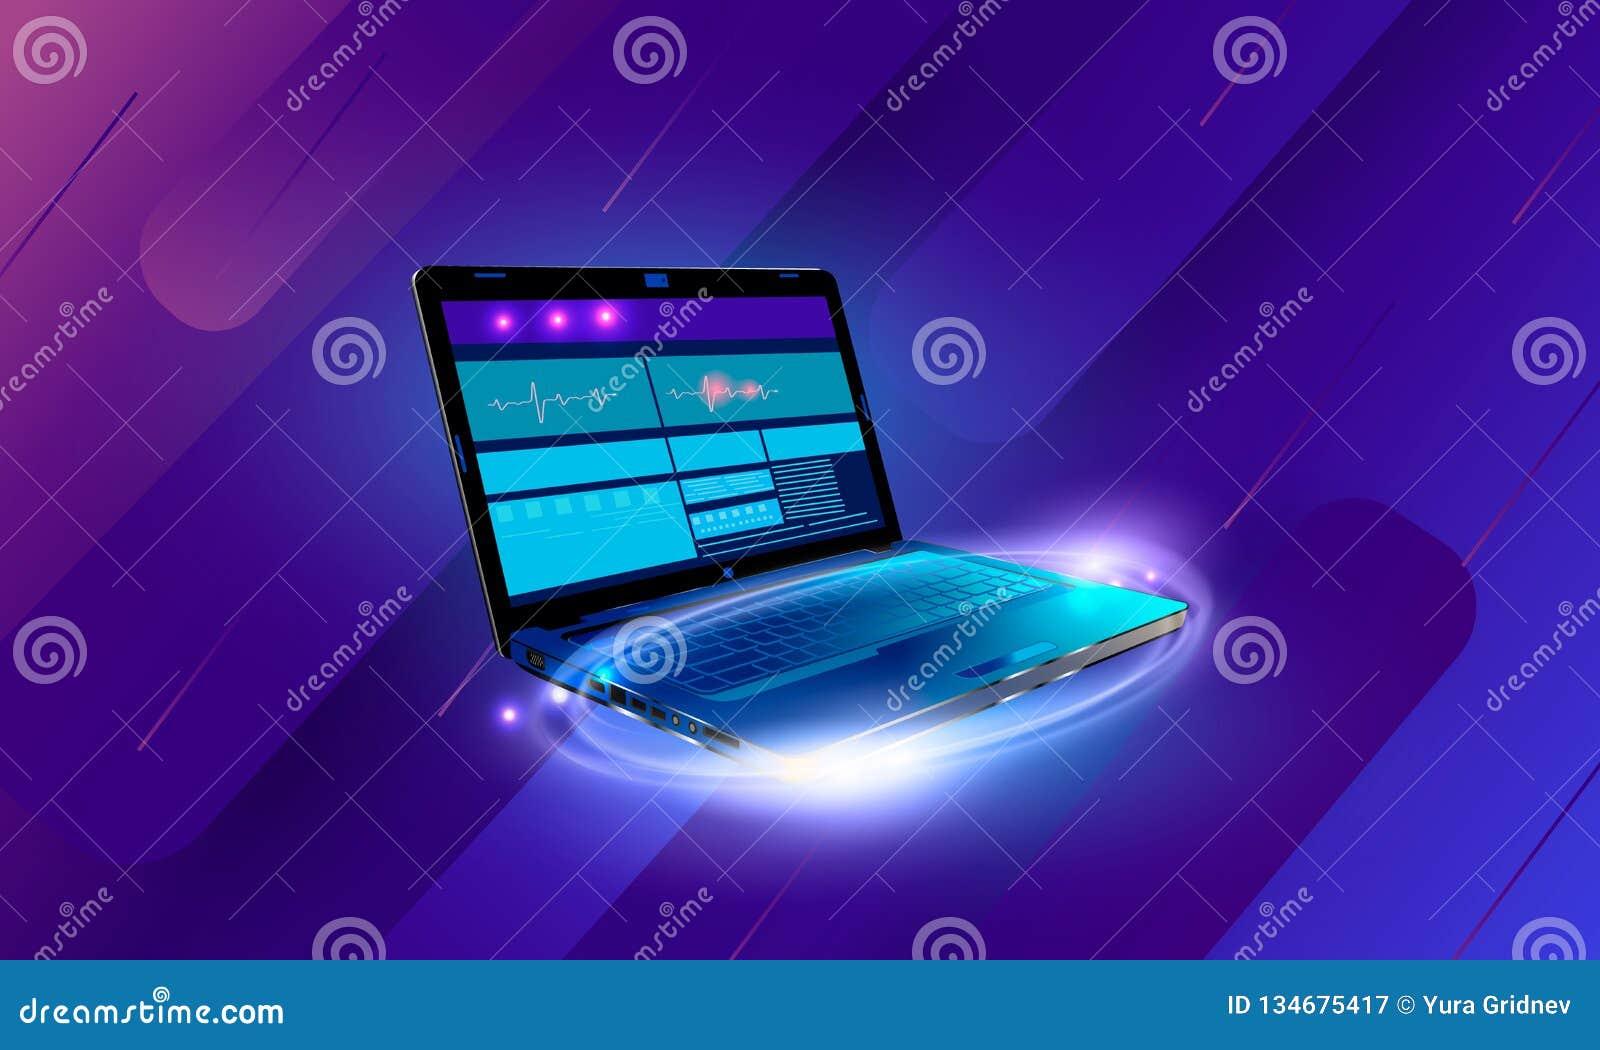 Web development and coding. Cross platform development website. Adaptive layout internet page or web interface on screen